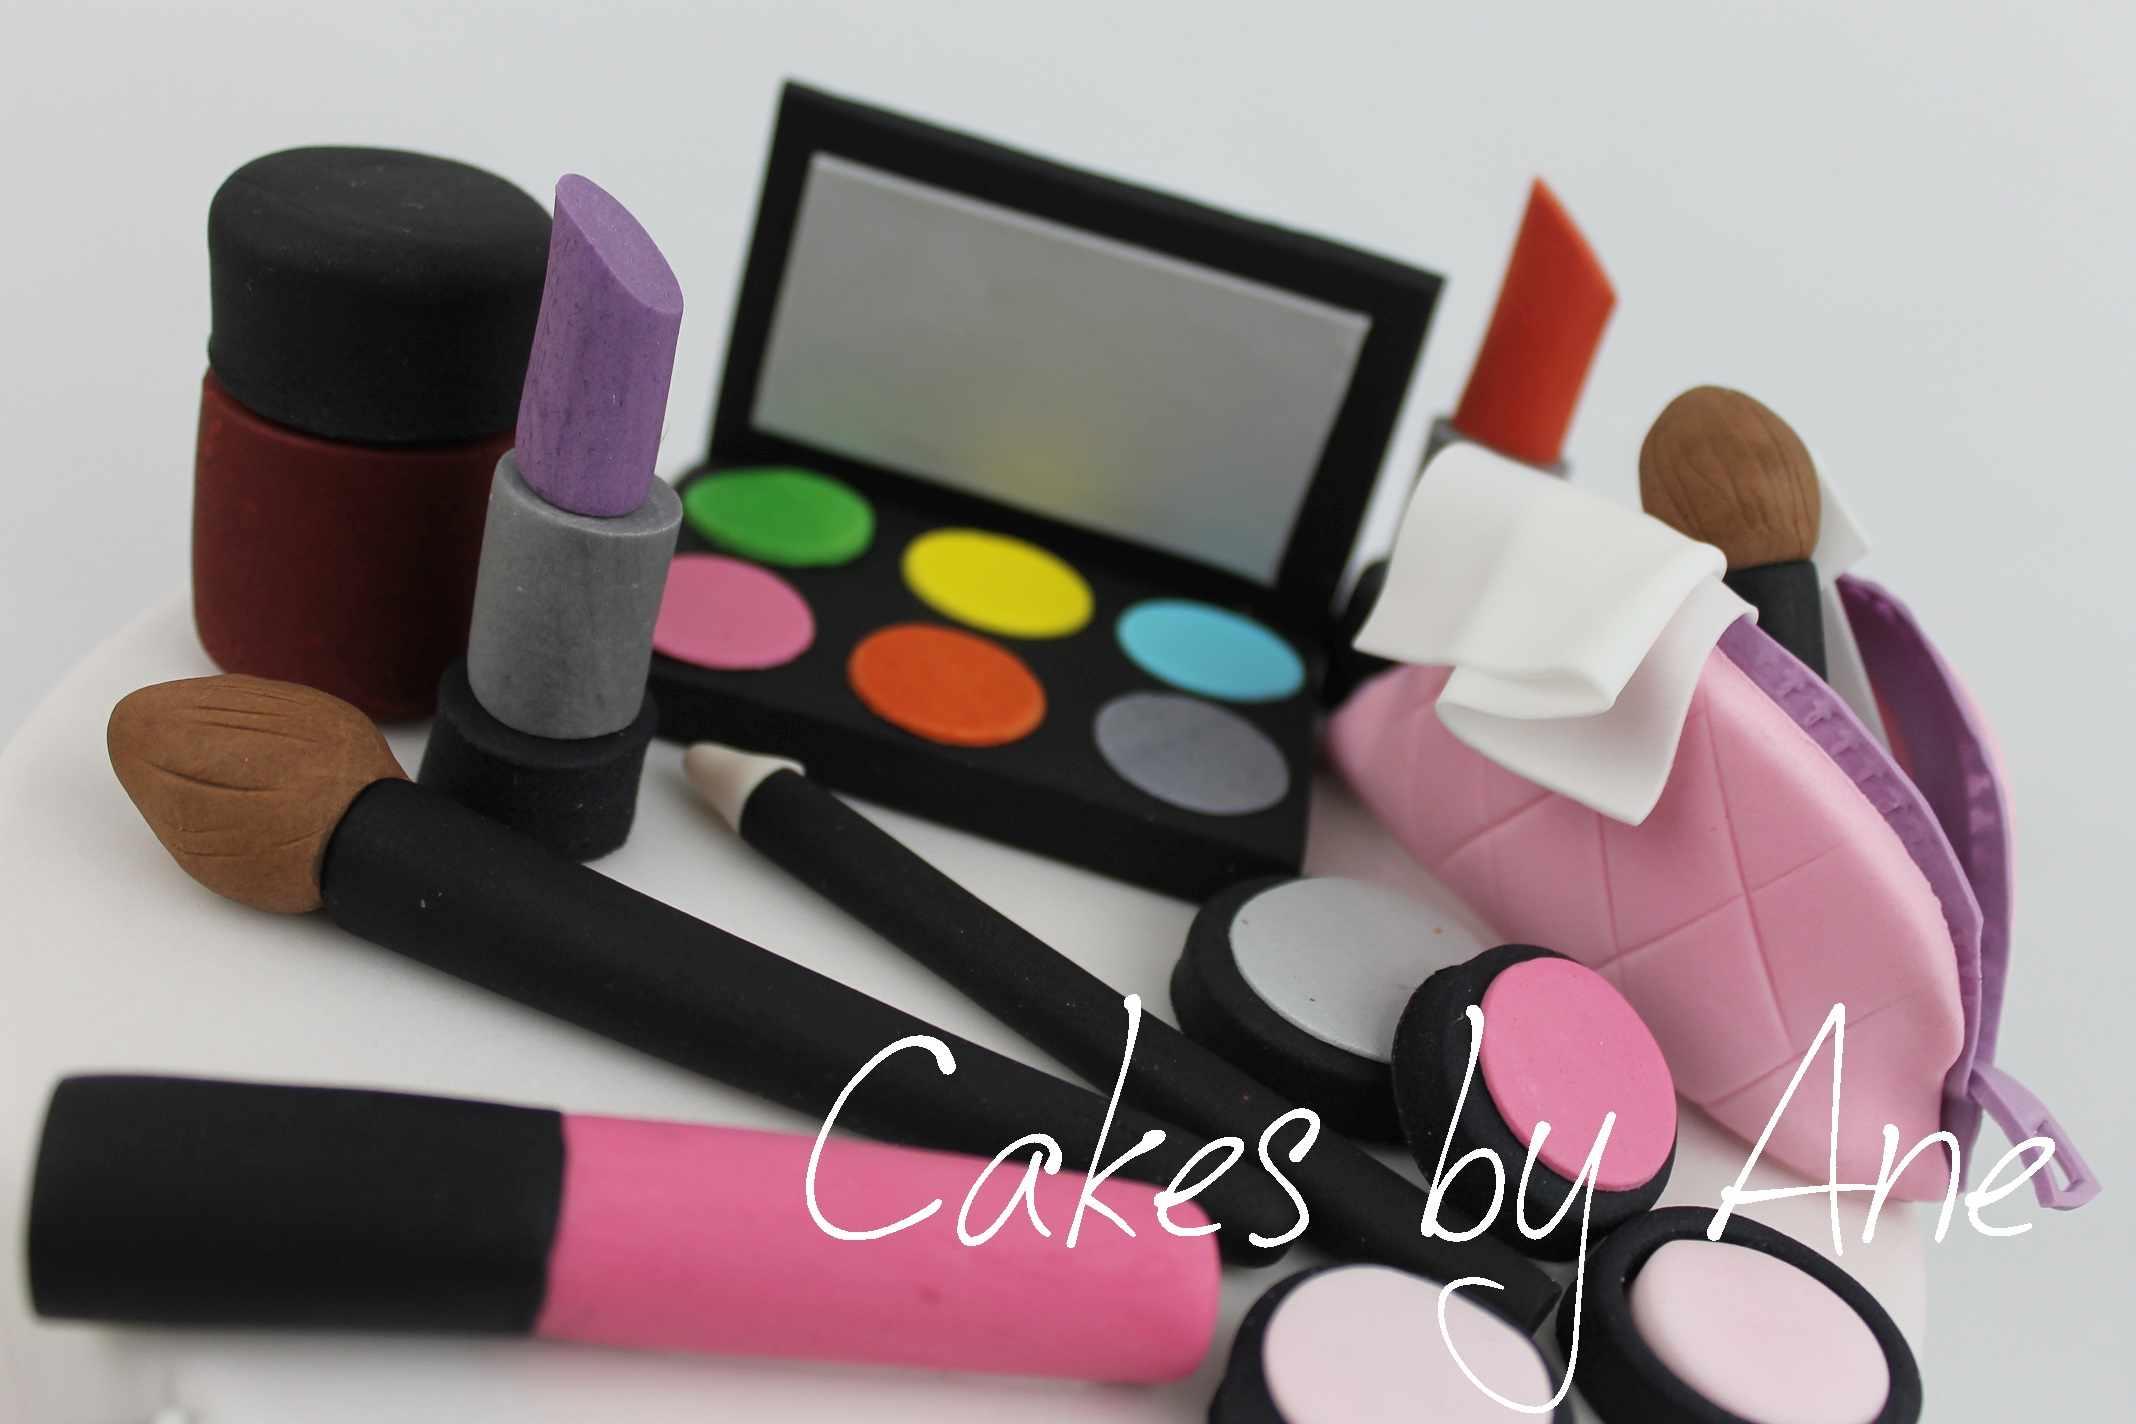 Mac makeup.com